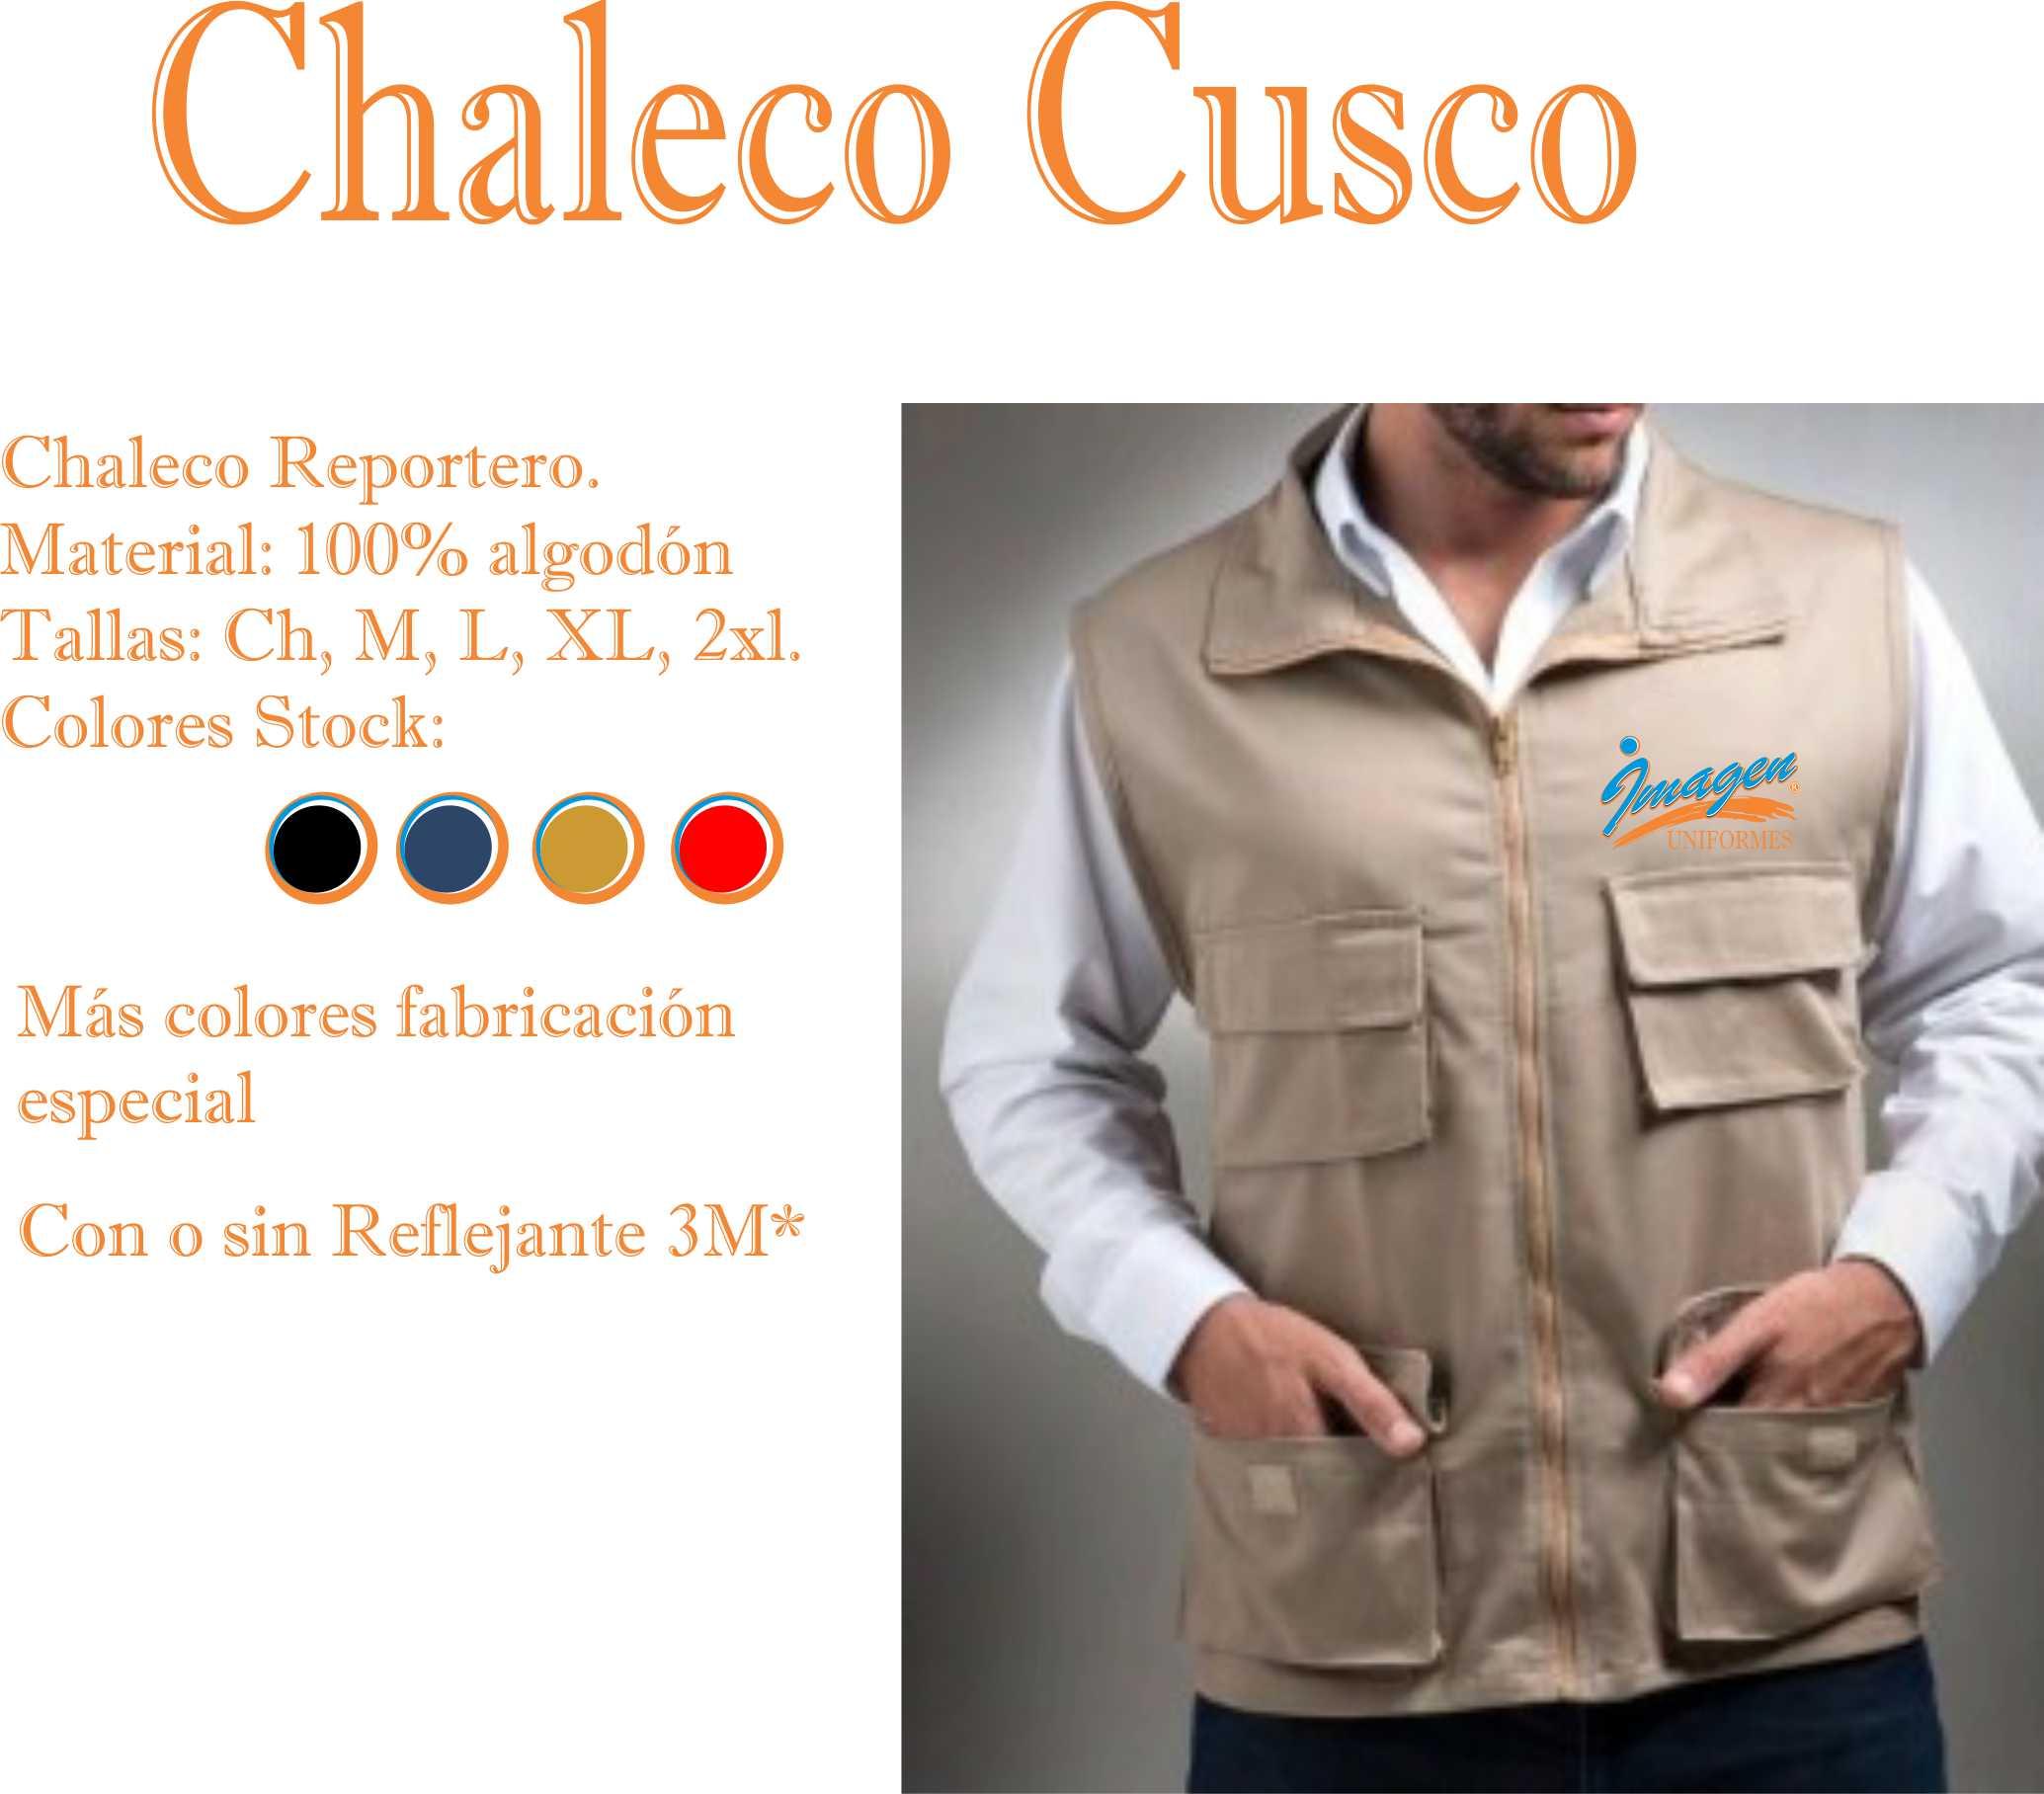 CHALECO CUSCO